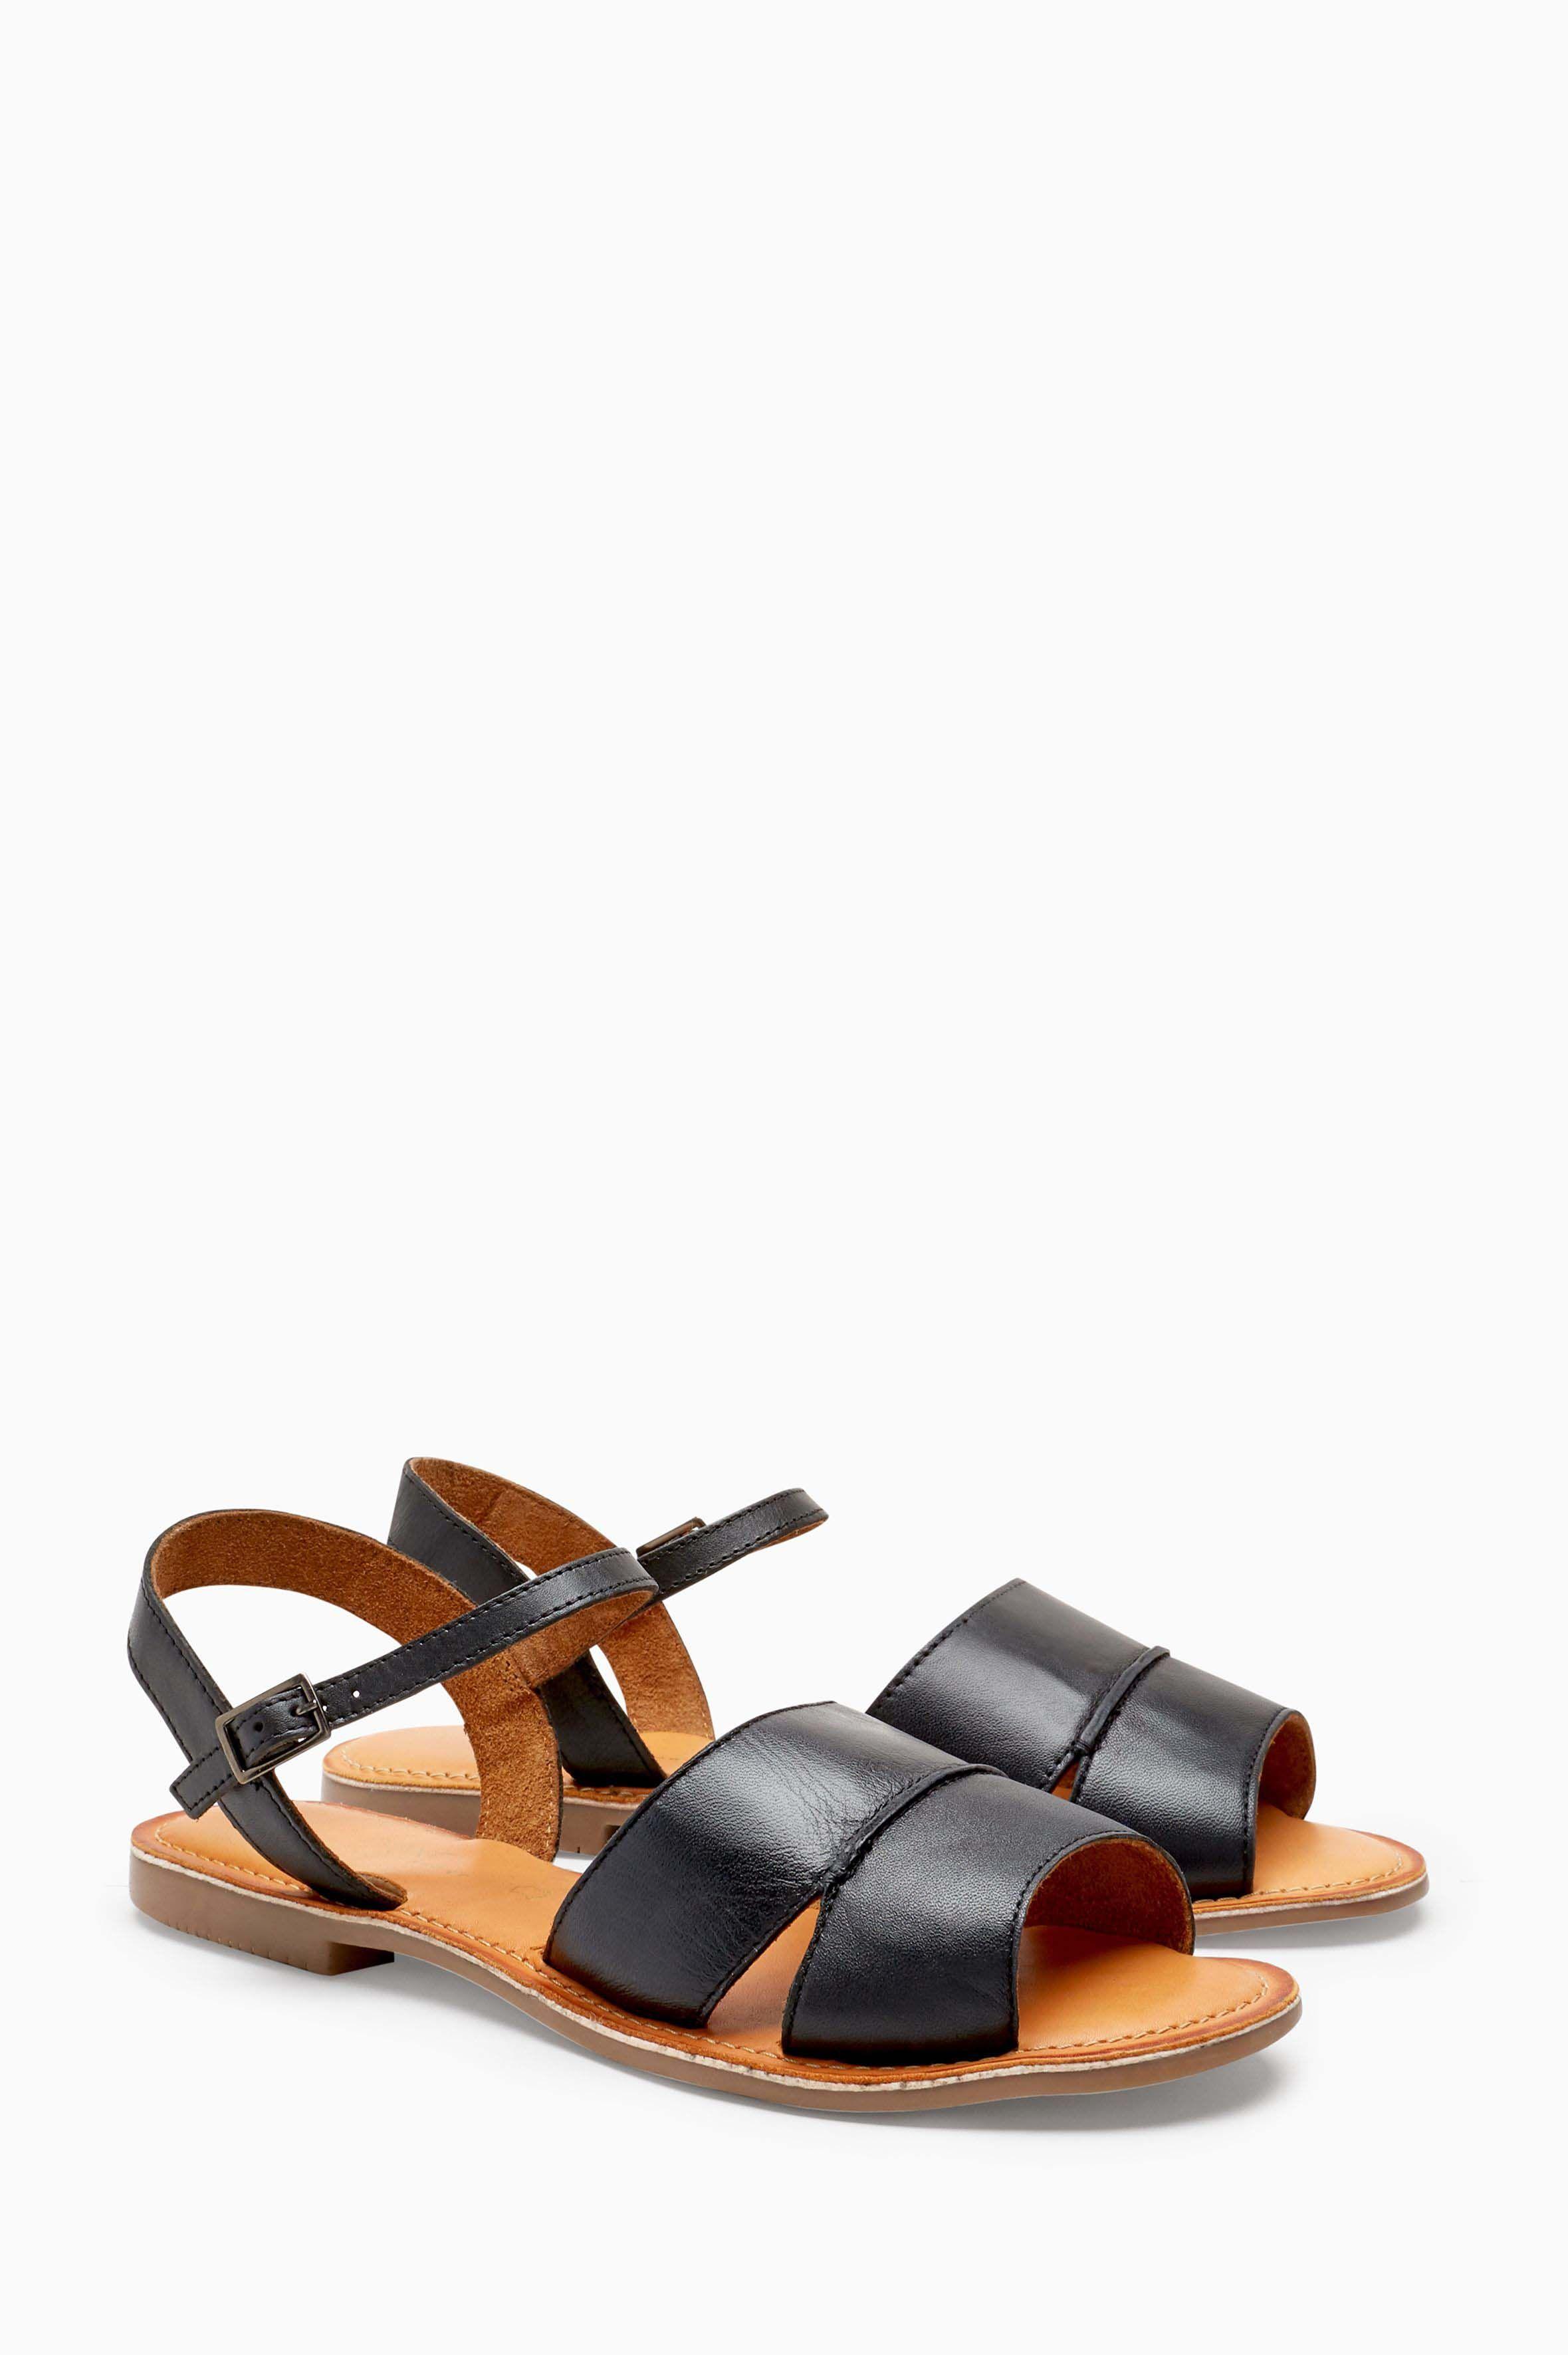 Black Leather Two Part Sandals - Black